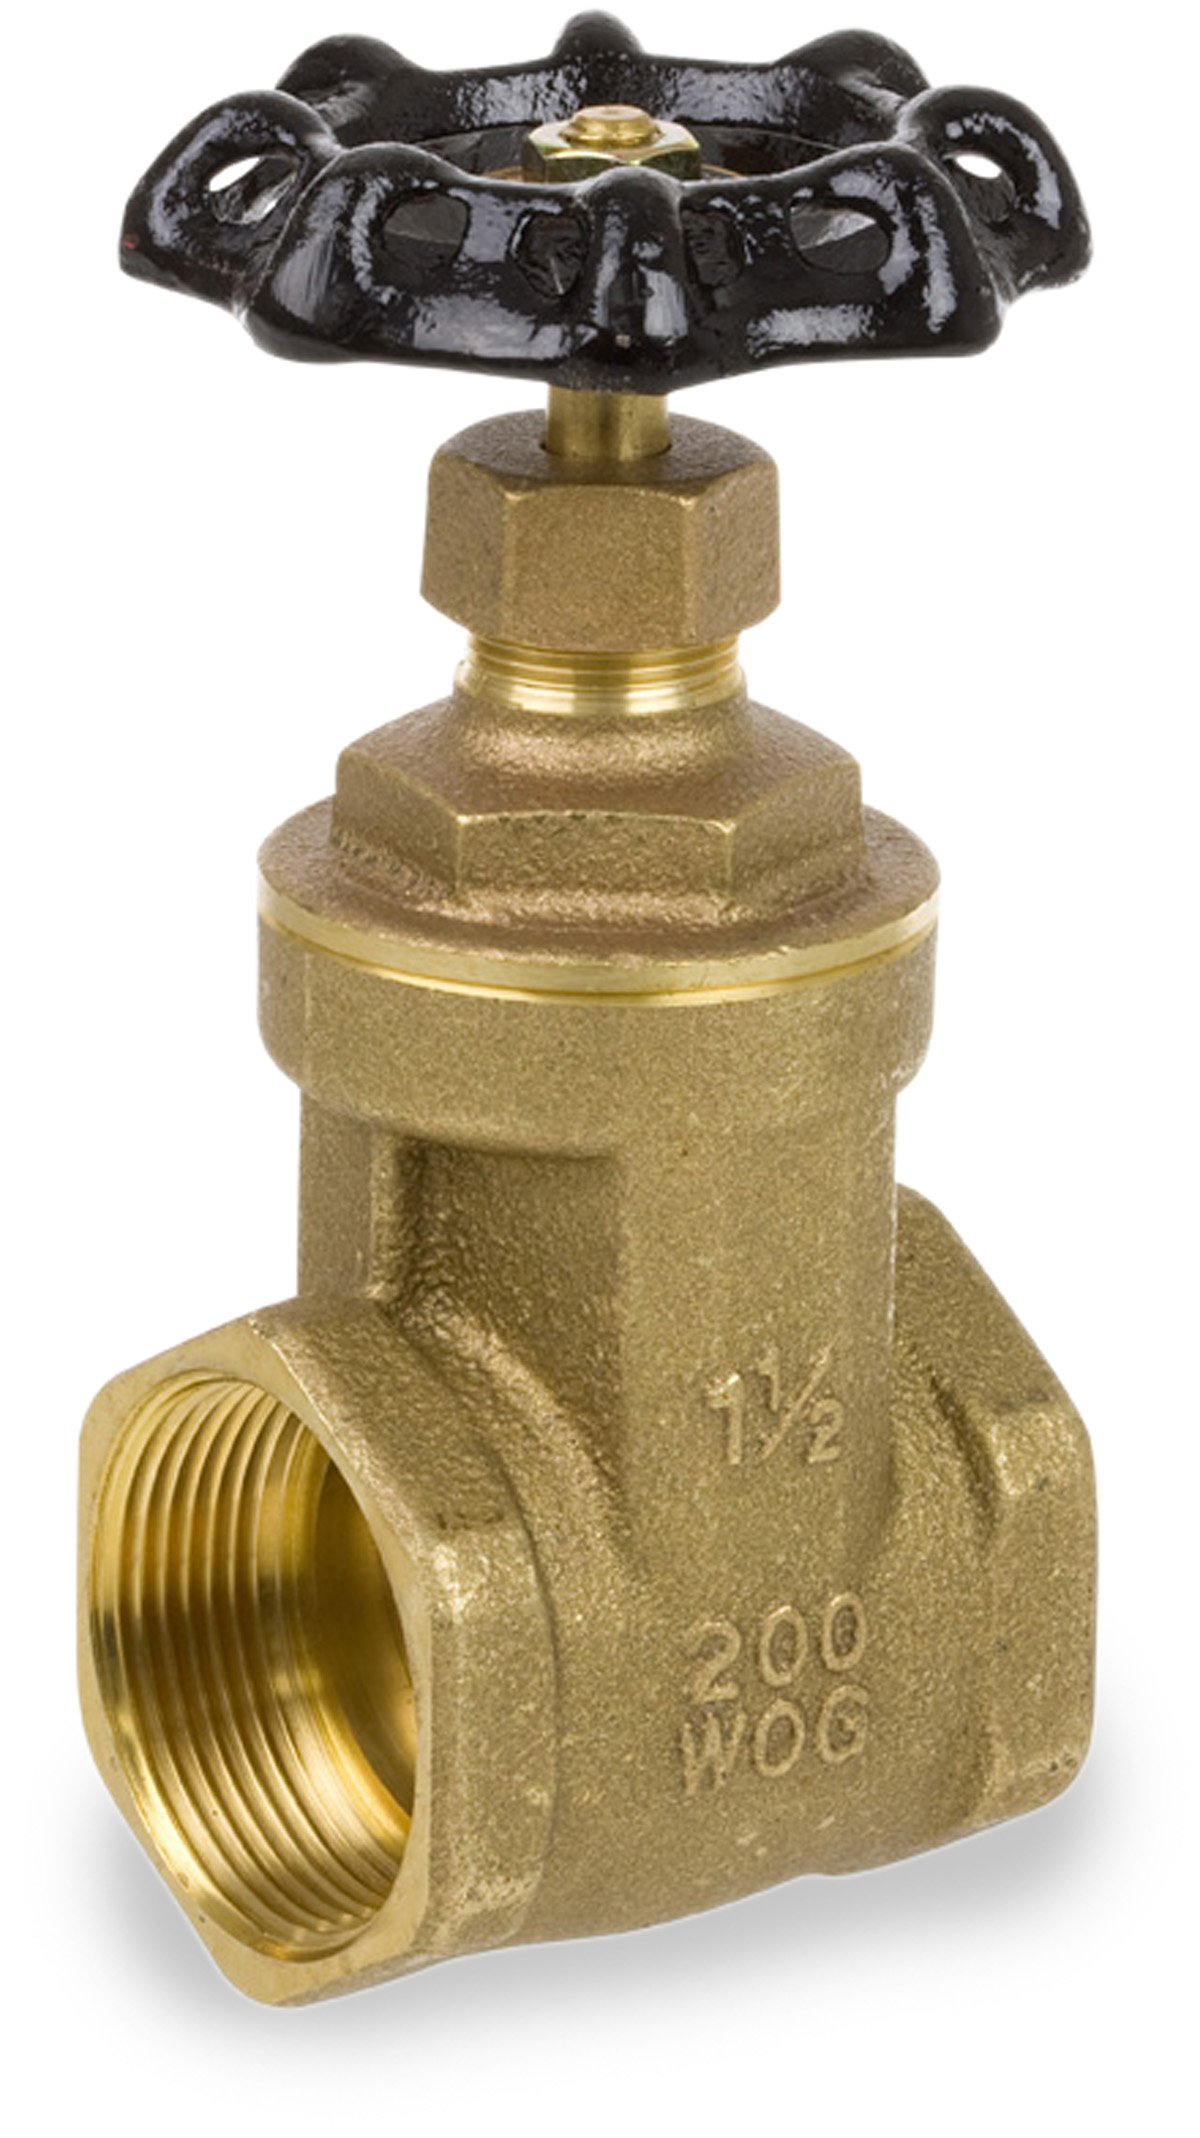 Smith-Cooper International 8501L Series Brass Gate Valve, Potable Water Service, Non-Rising Stem, Inline, 1-1/4'' NPT Female